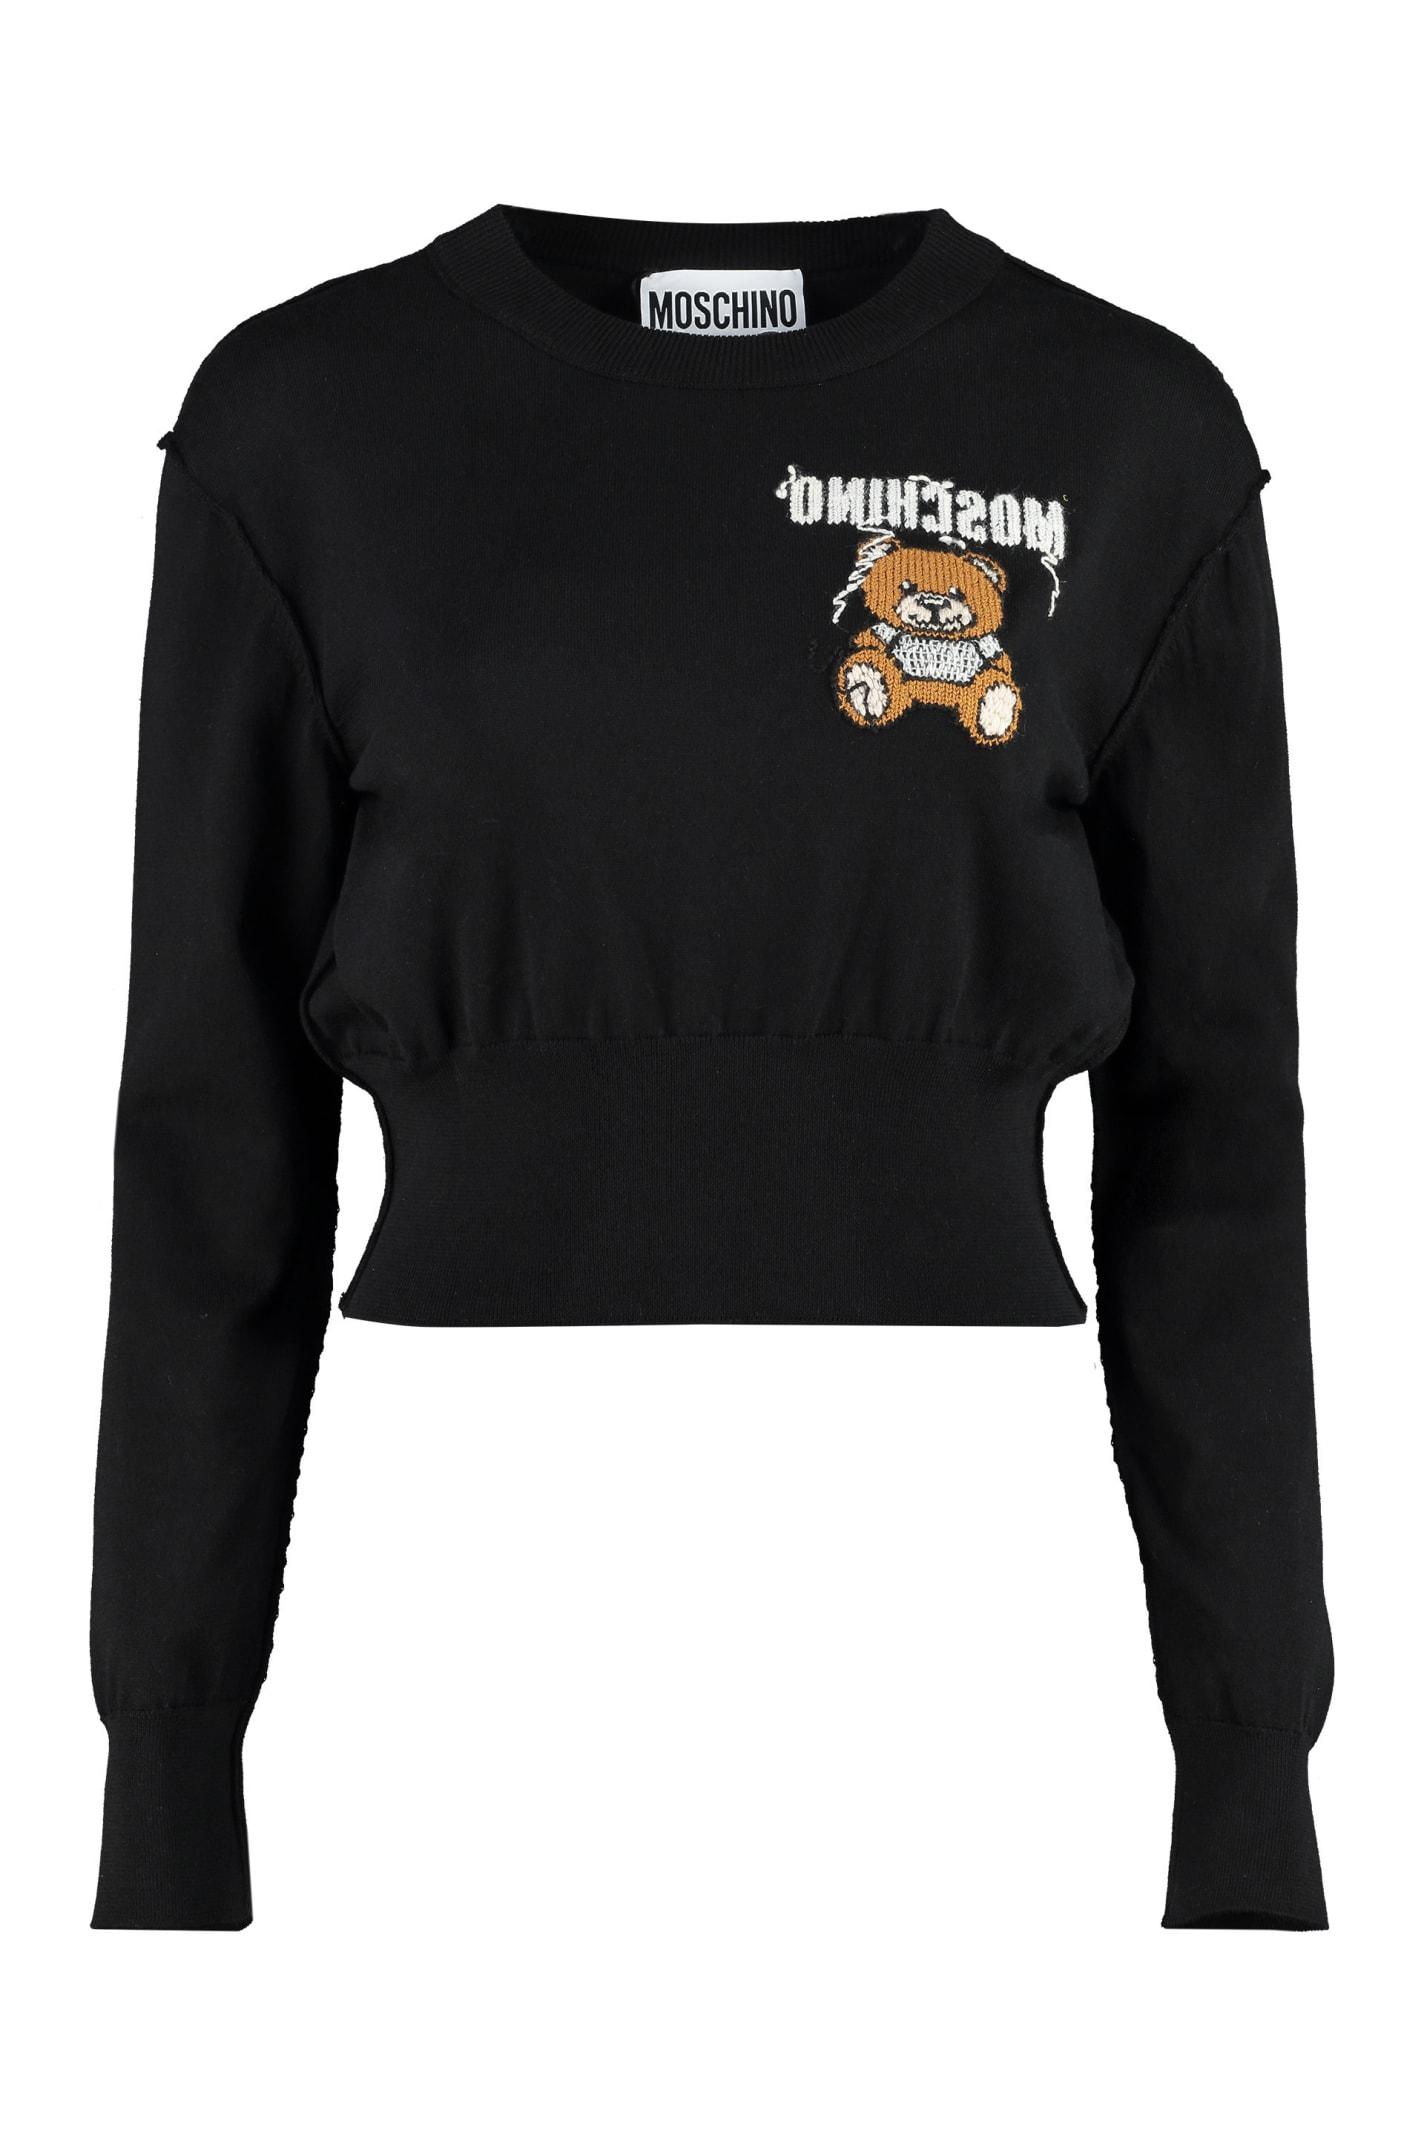 Moschino Embroidered Crew-neck Sweater